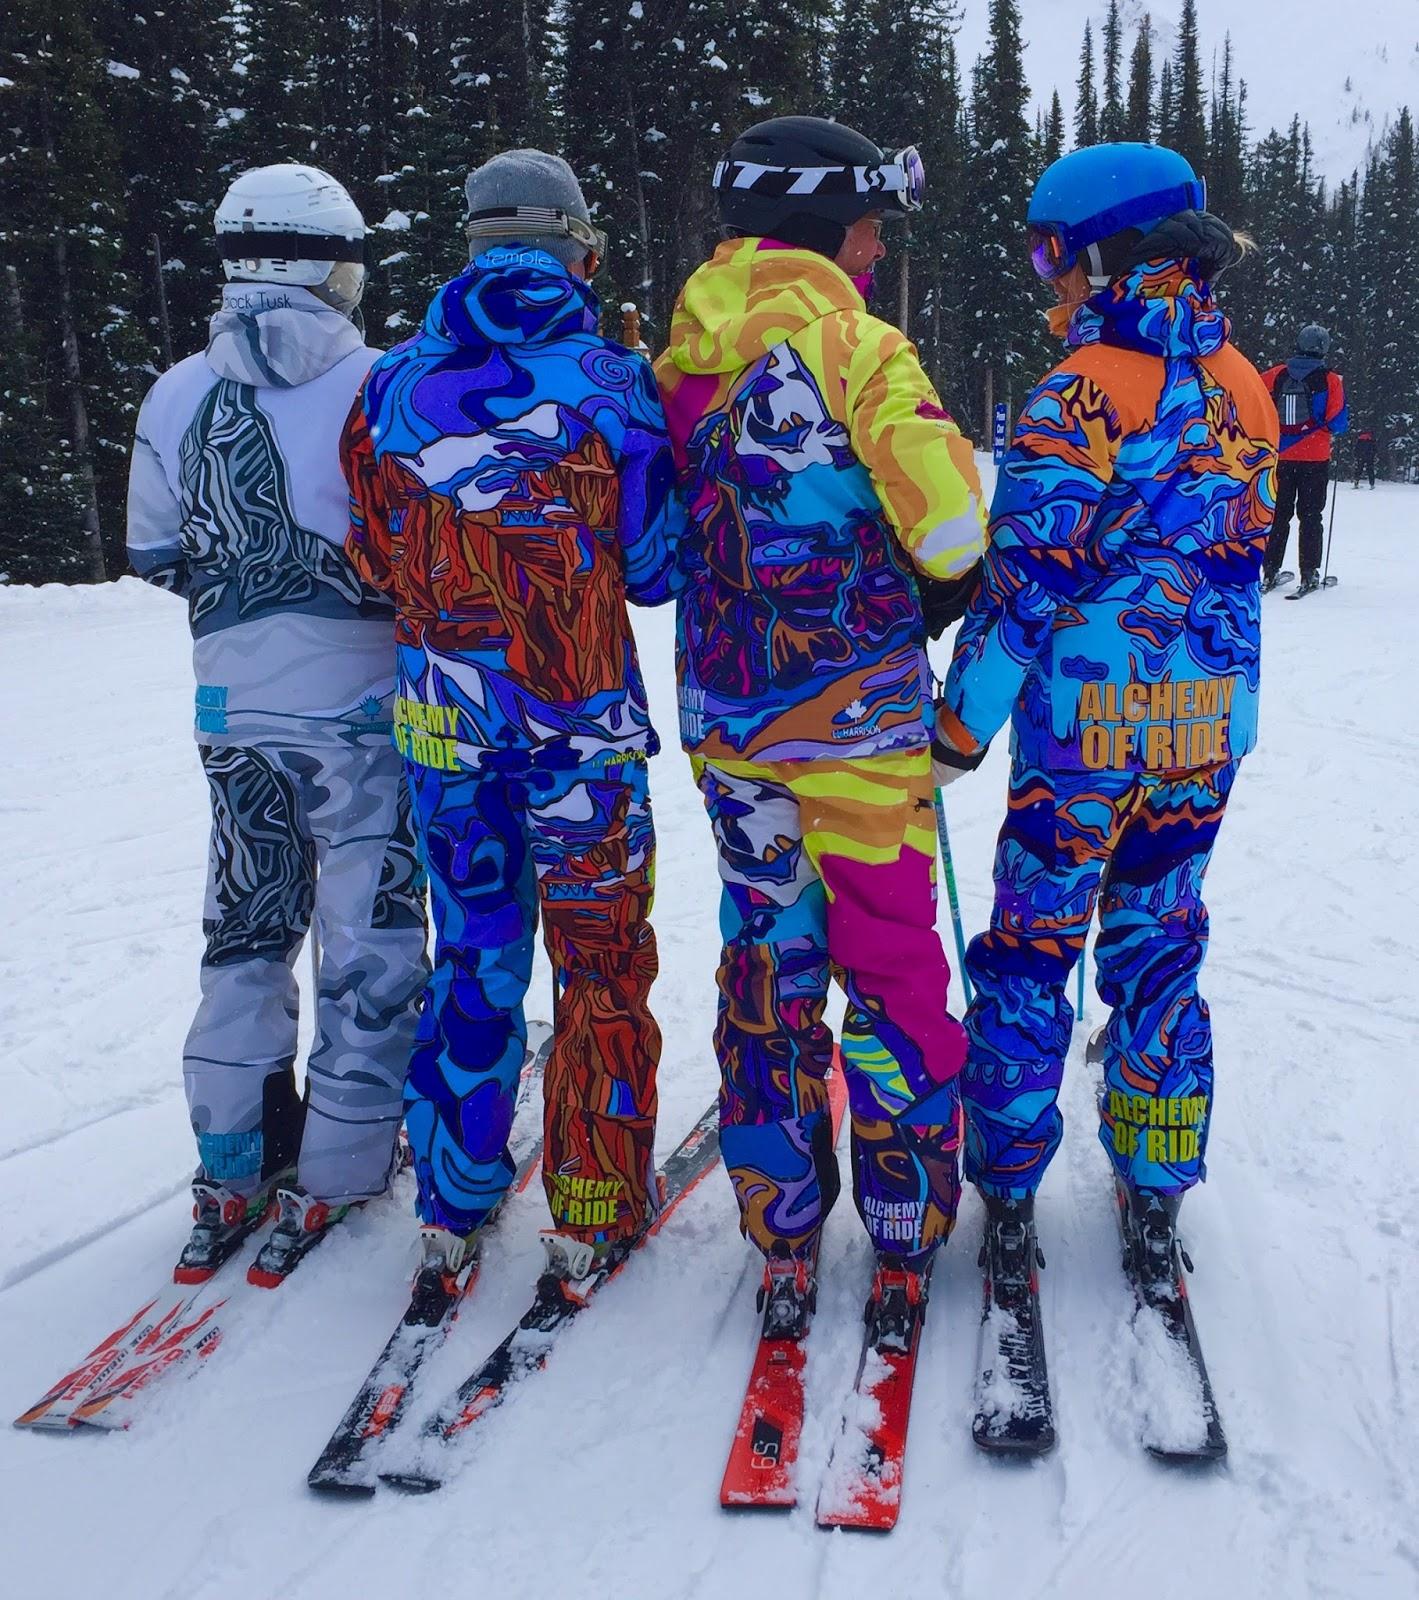 One Two Ski: Gear